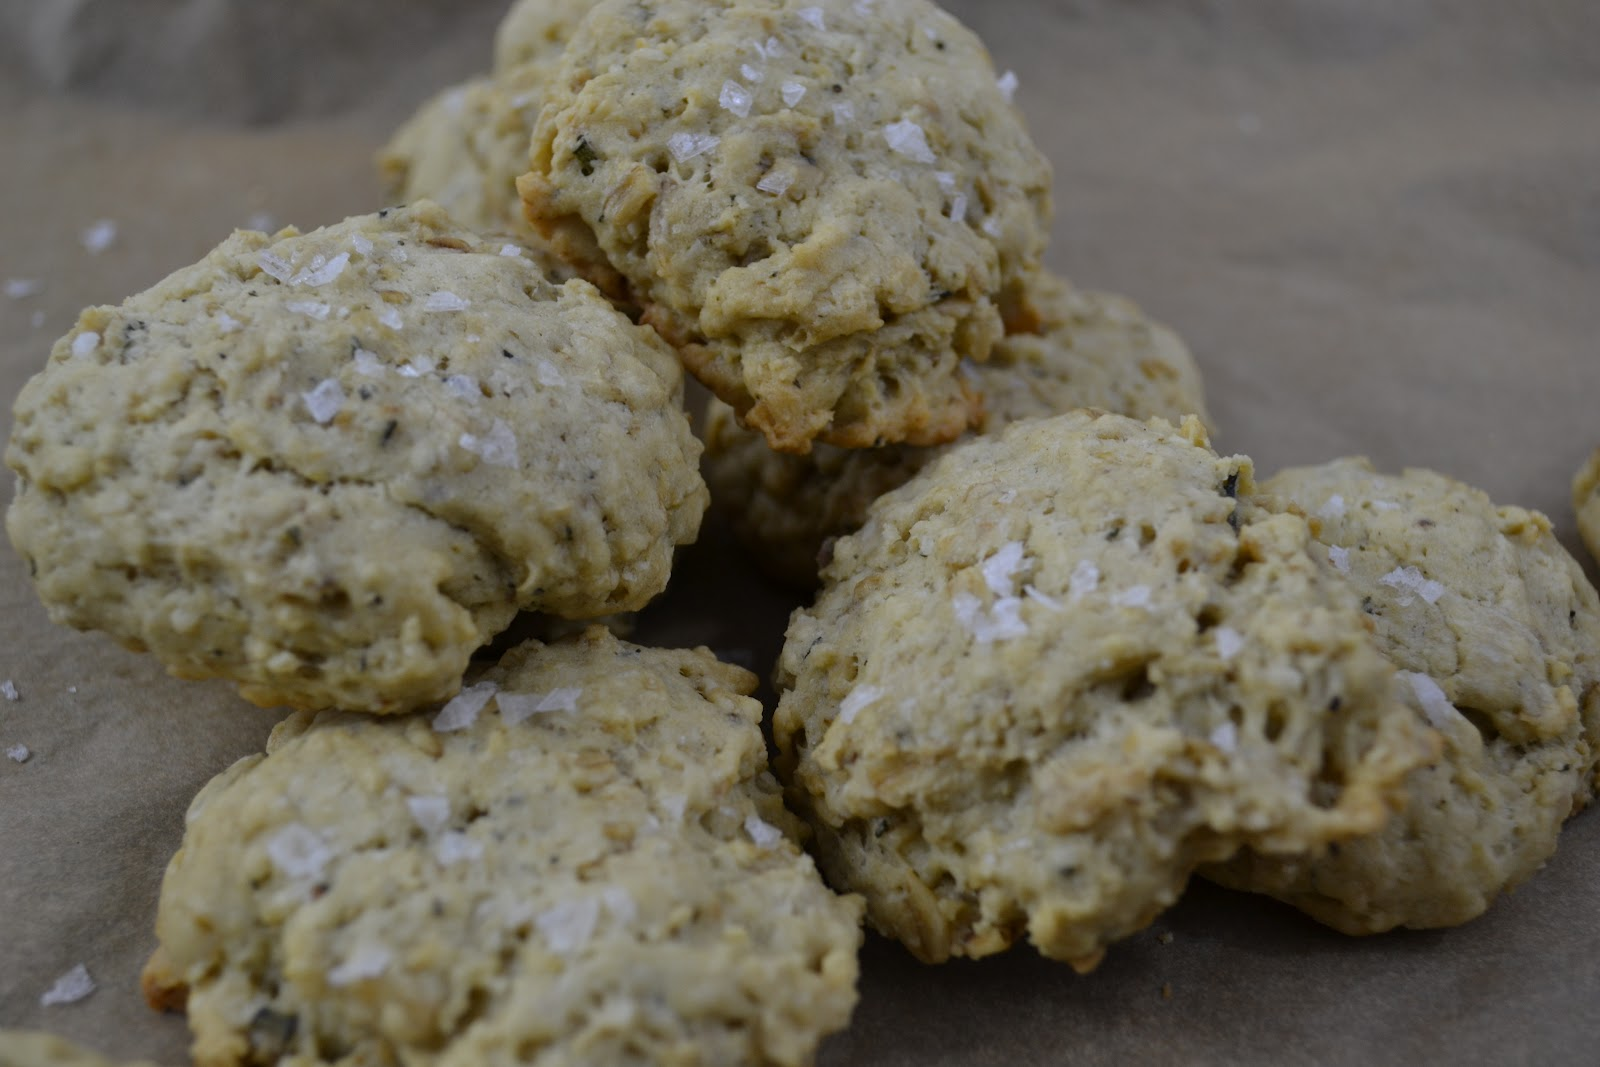 kale and kumquats: Savory Oatmeal Cookies